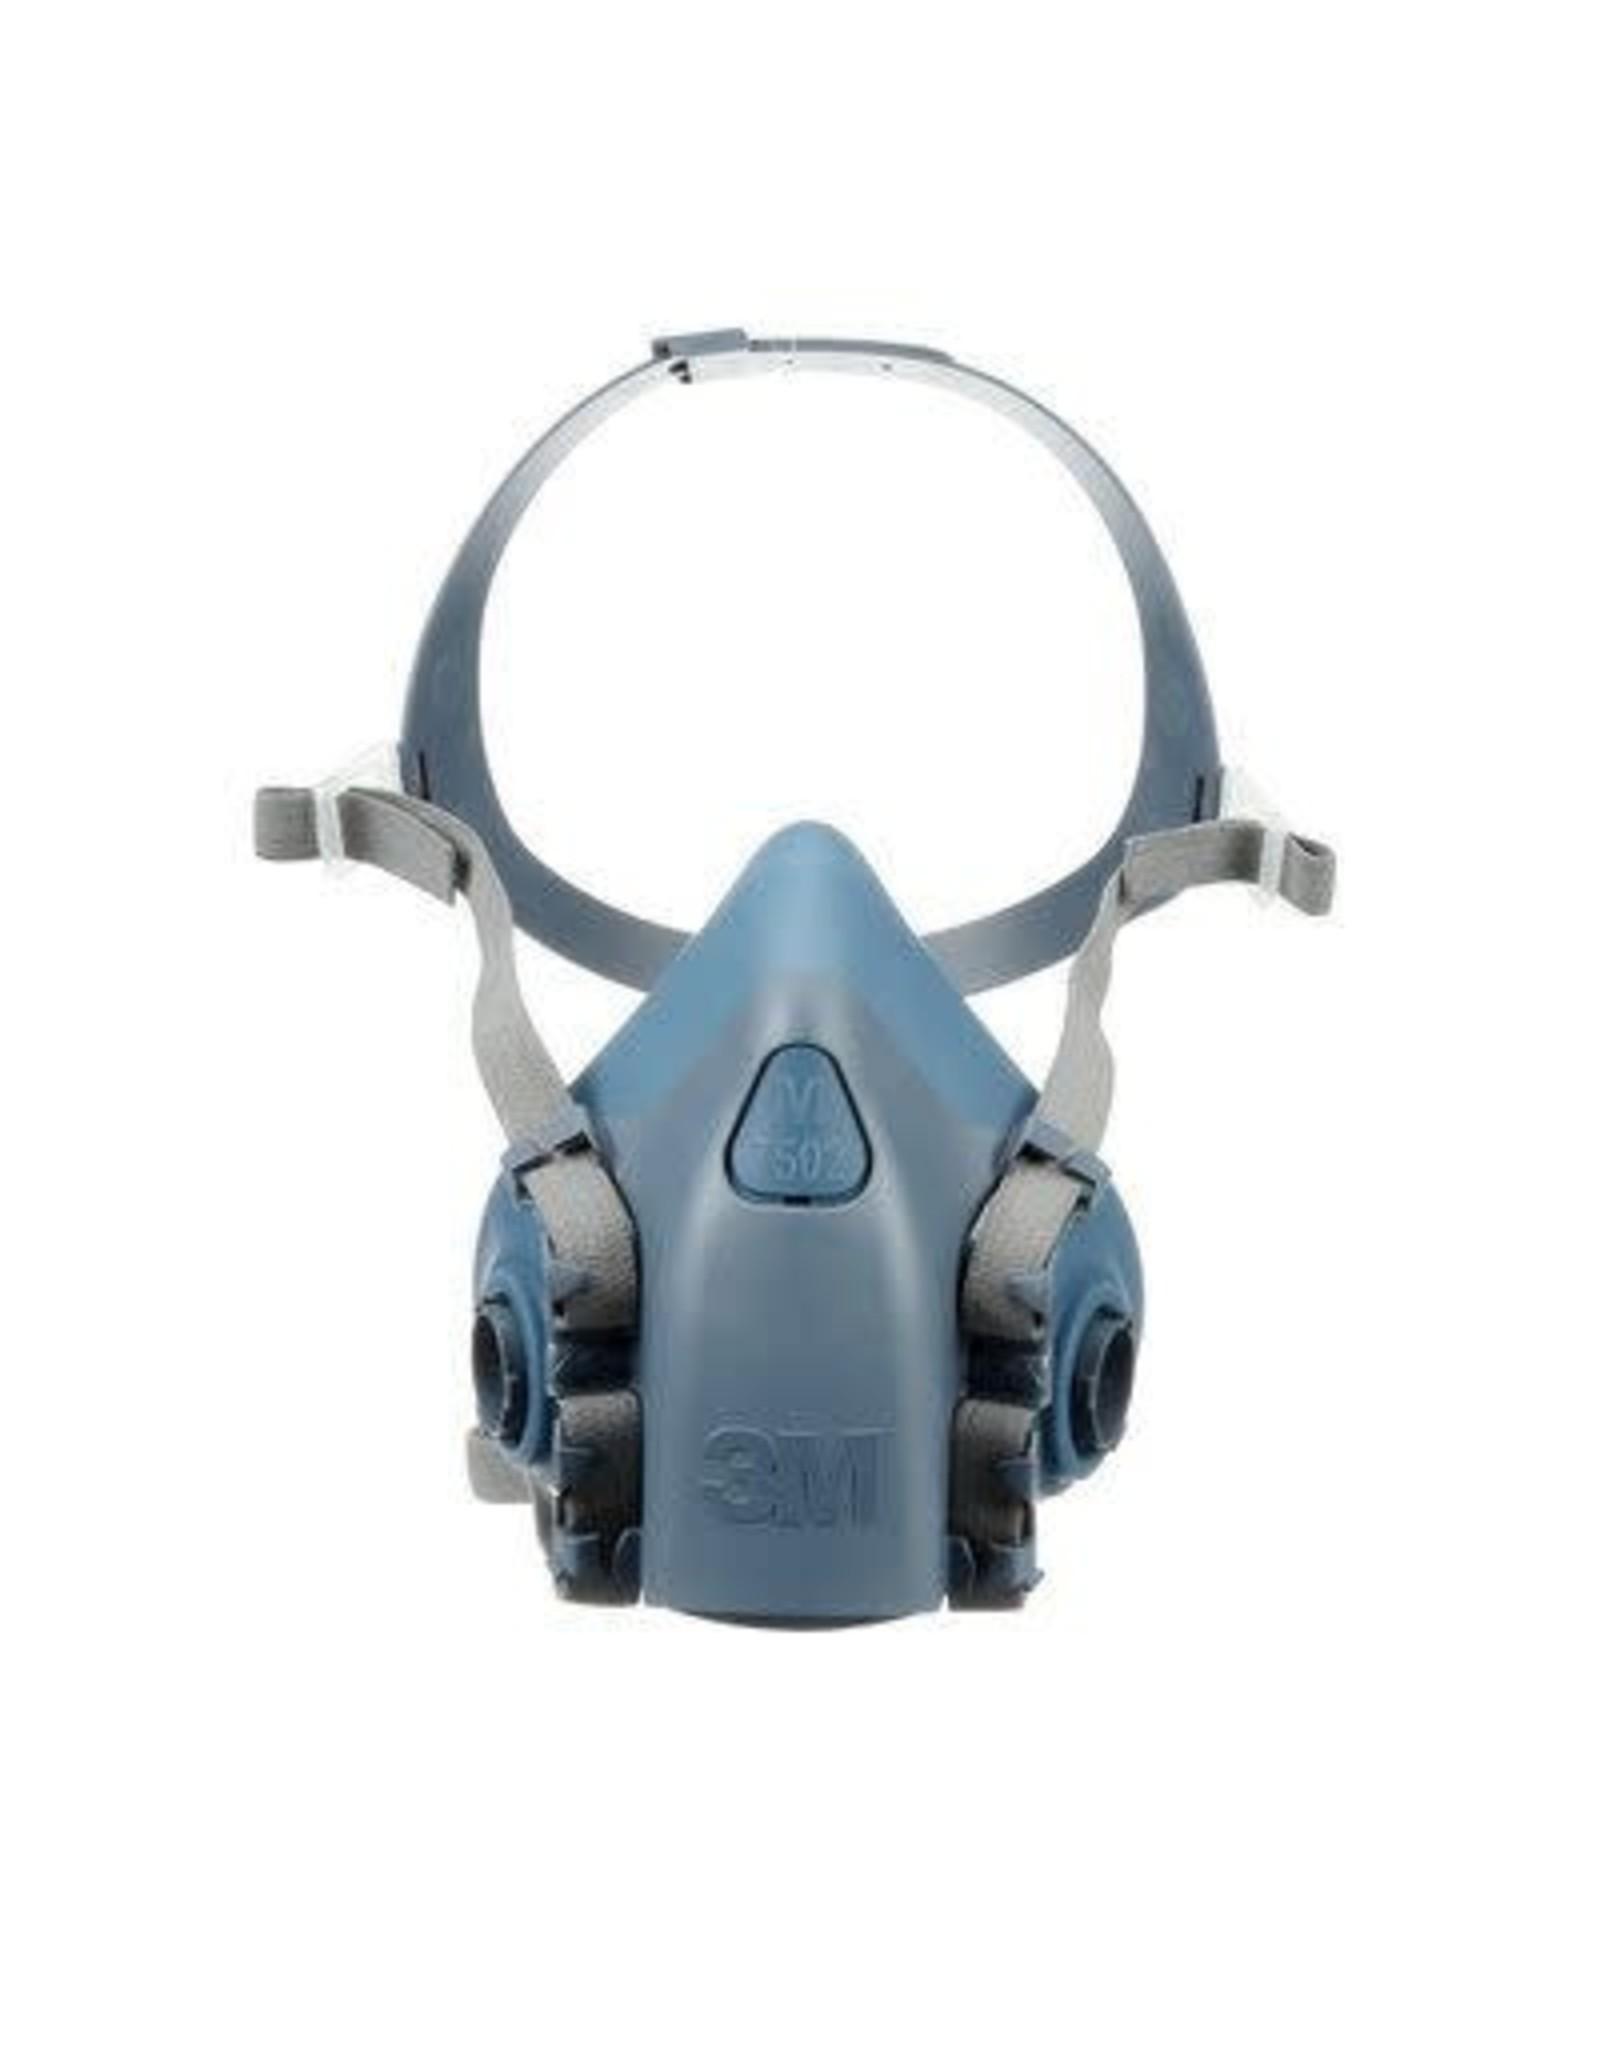 3M™ 7500 Series Half Mask Respirator